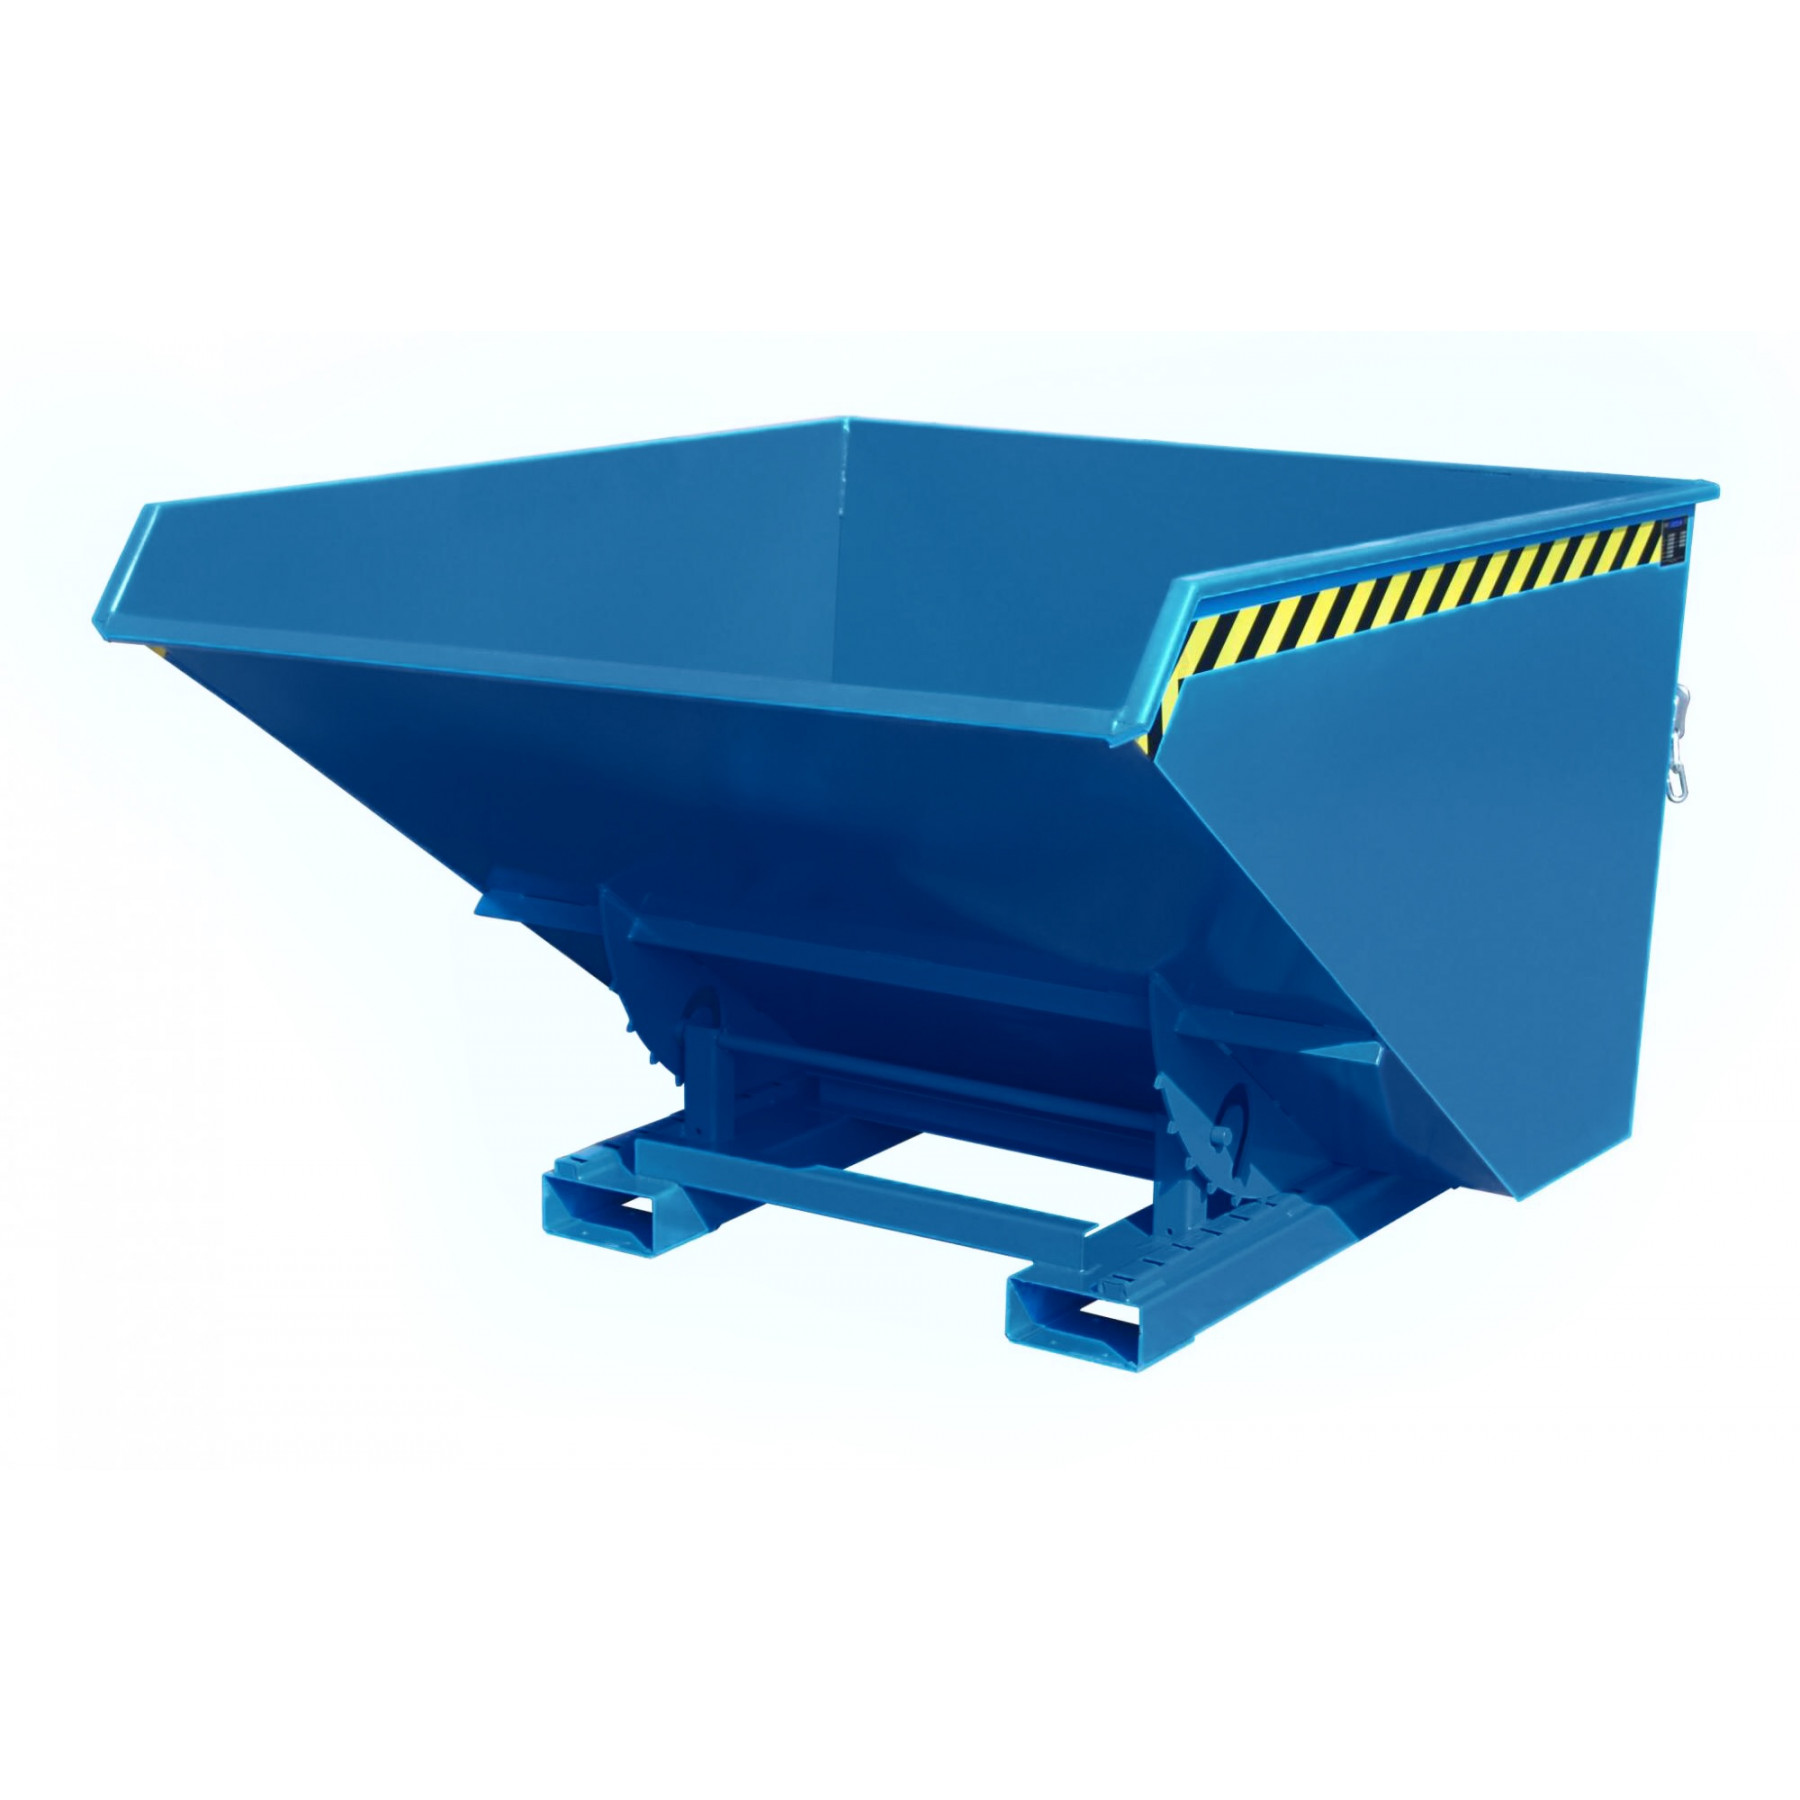 Kiepcontainer hoog model, gelakt of verzinkt, type MTF 1700 liter